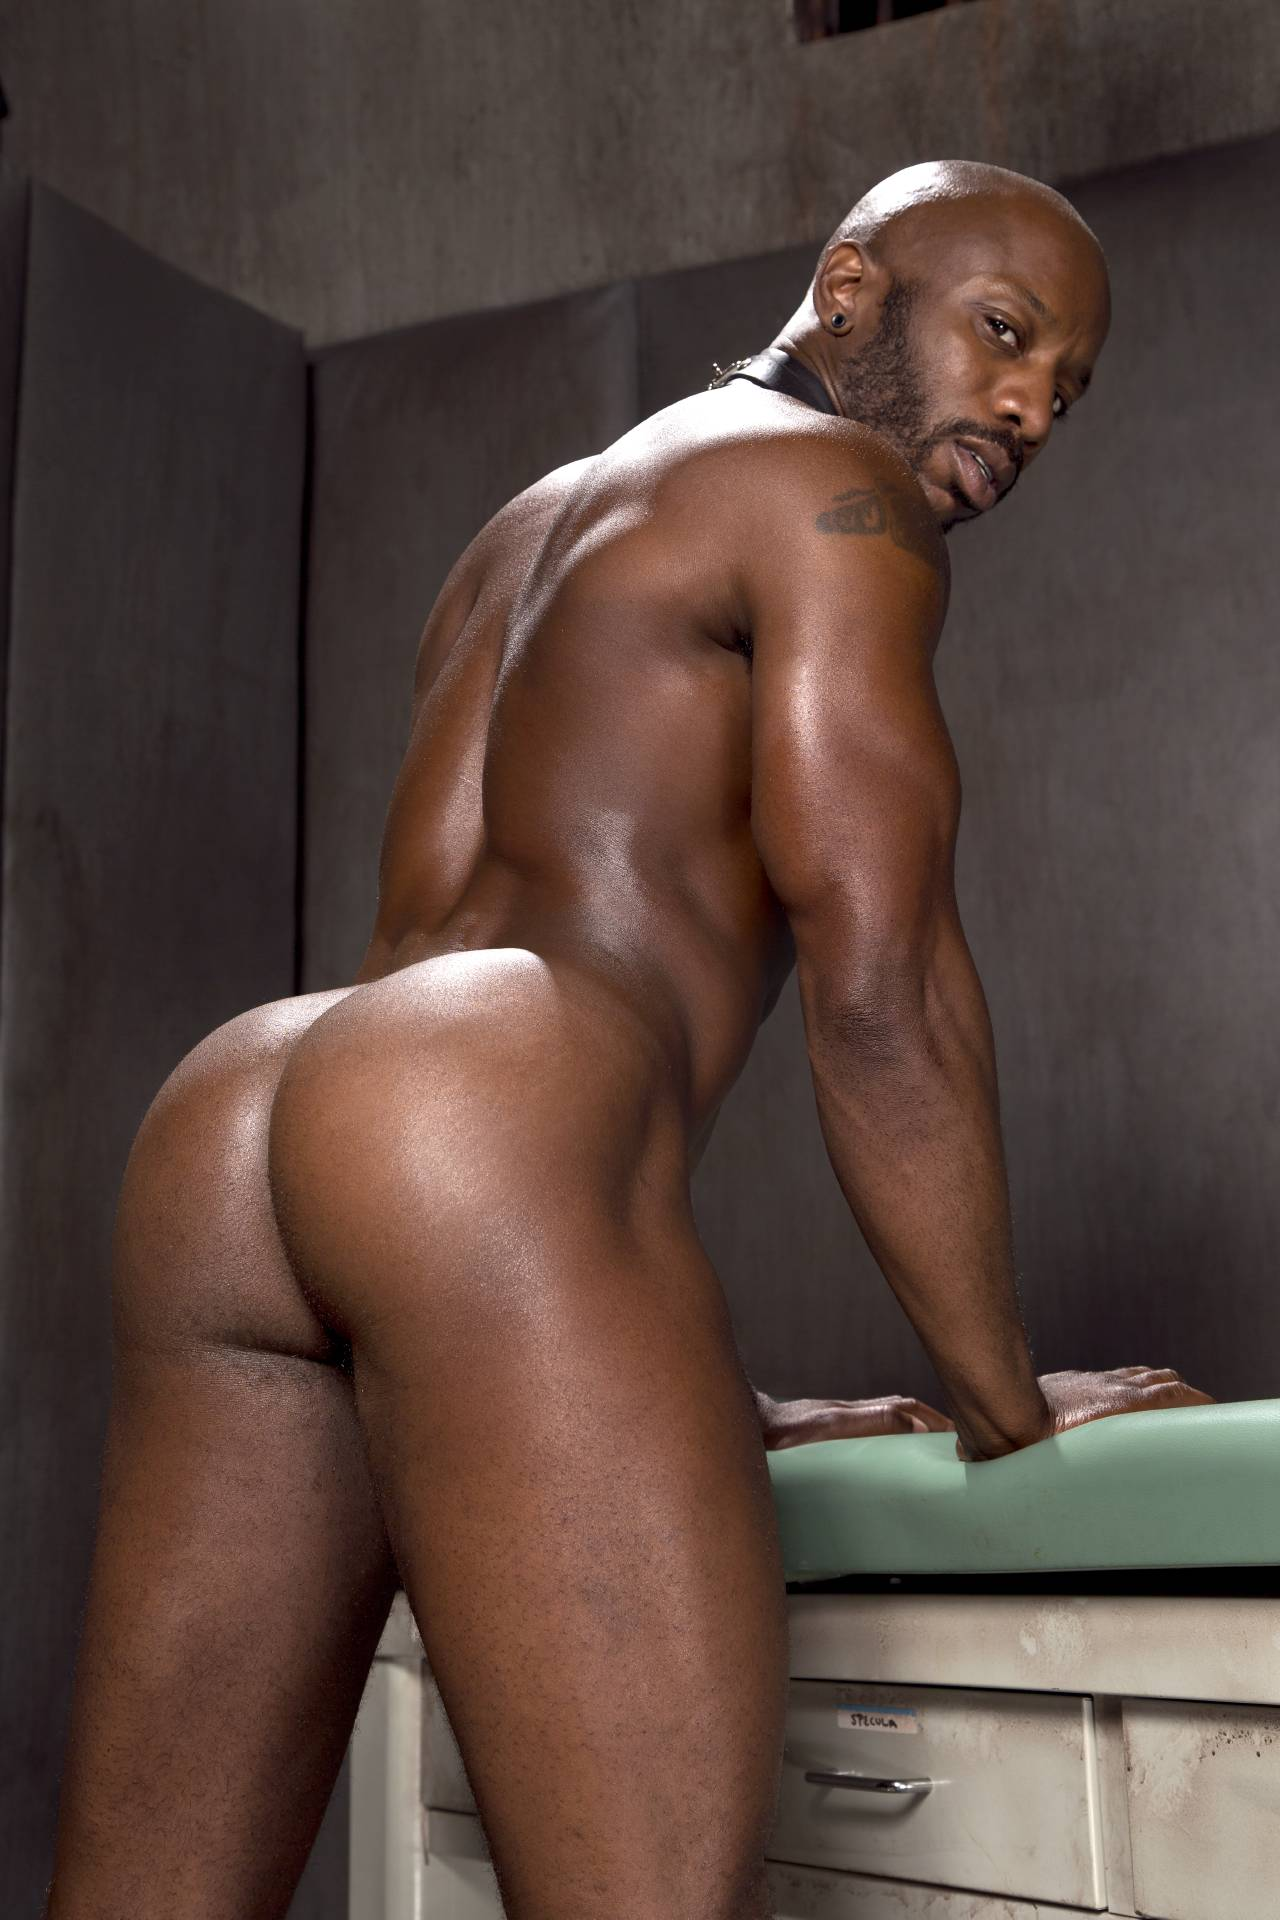 Hot gay scene preston gets hunter nude and 2